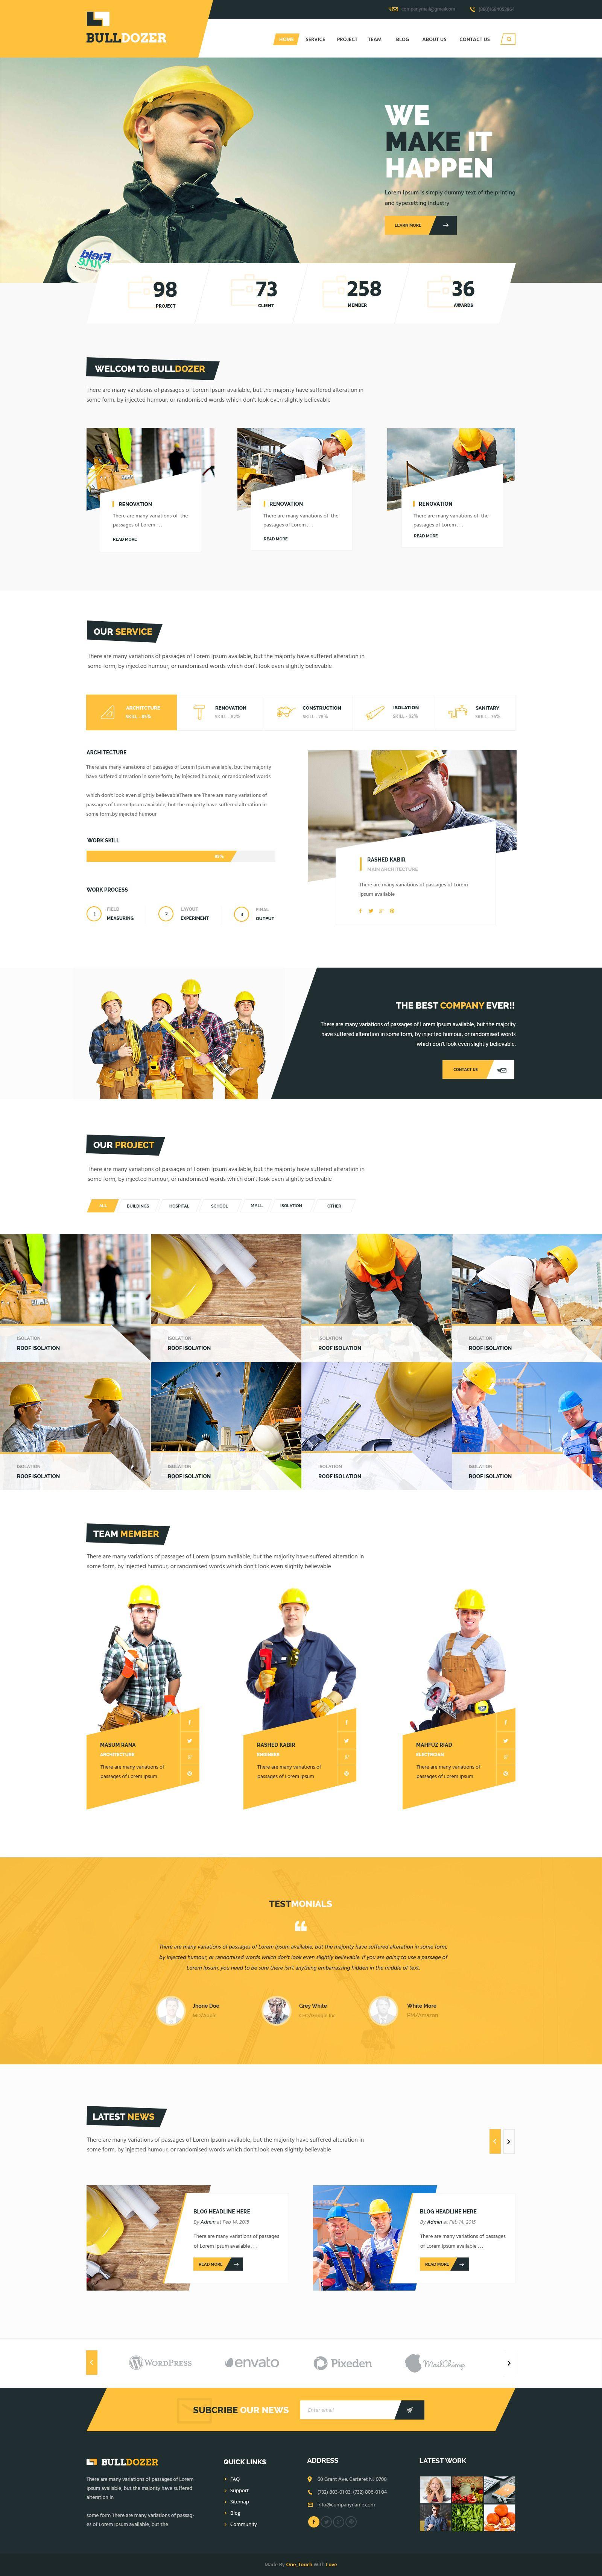 Web Design Company Digital Marketing Solution Nyc Nj Wordpress Website Design Wordpress Web Design Wp Themes